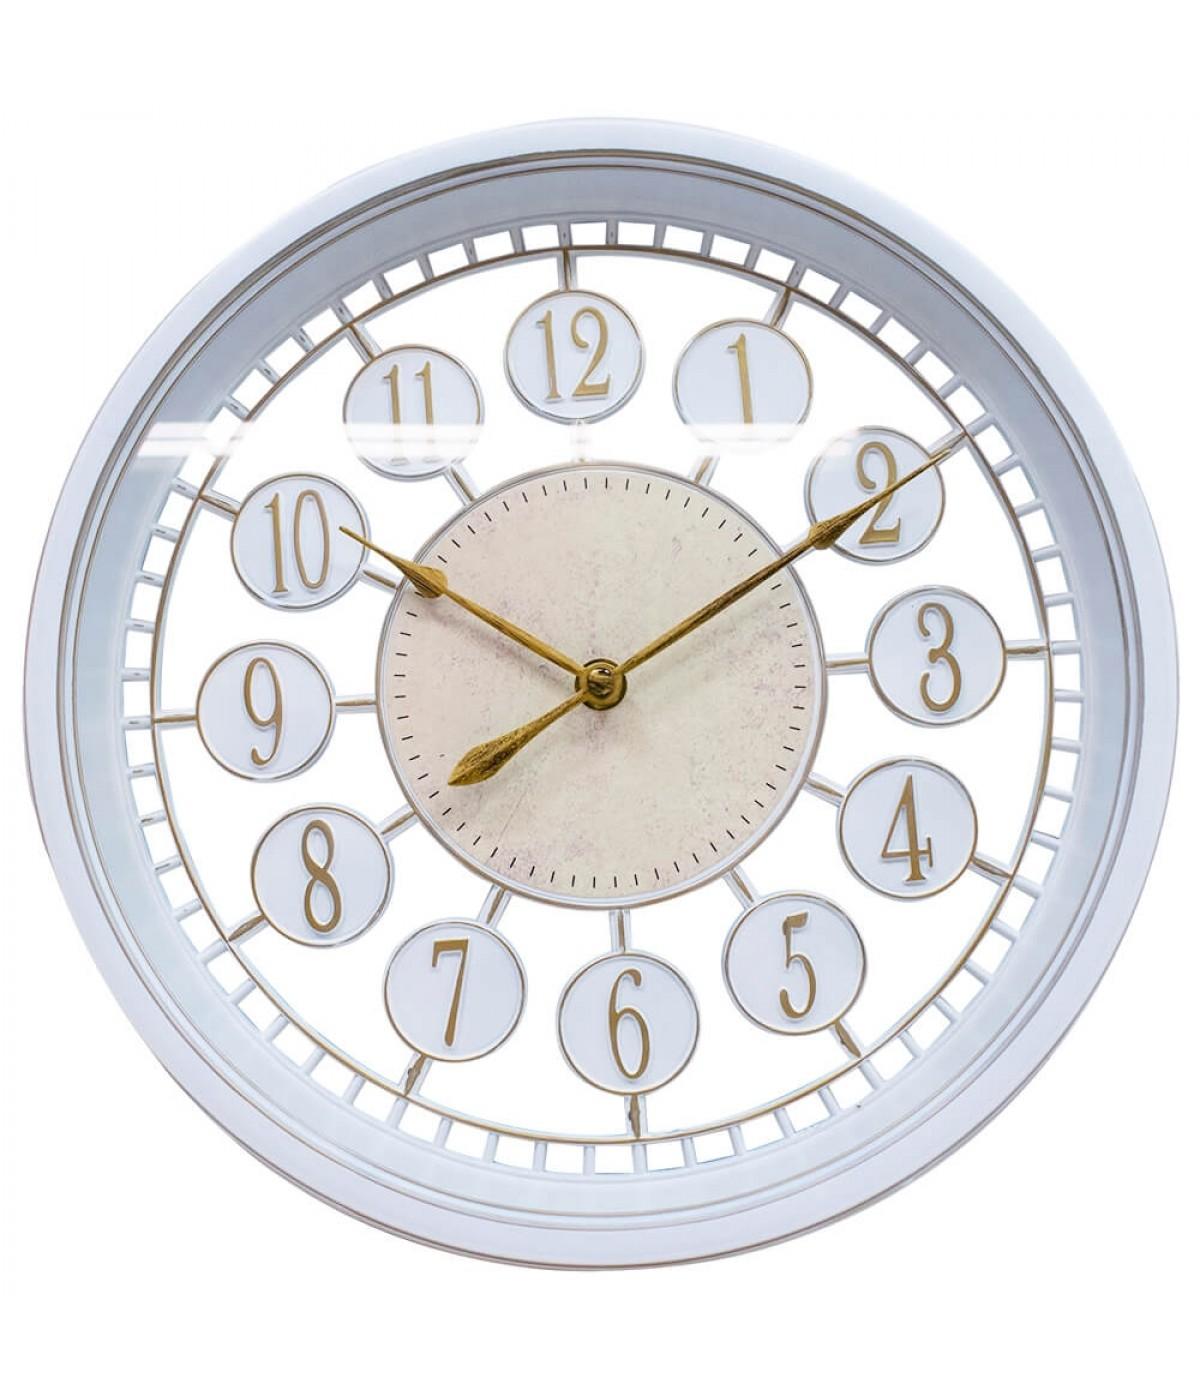 c0128d03d18 Relógio Parede Branco 30x30cm